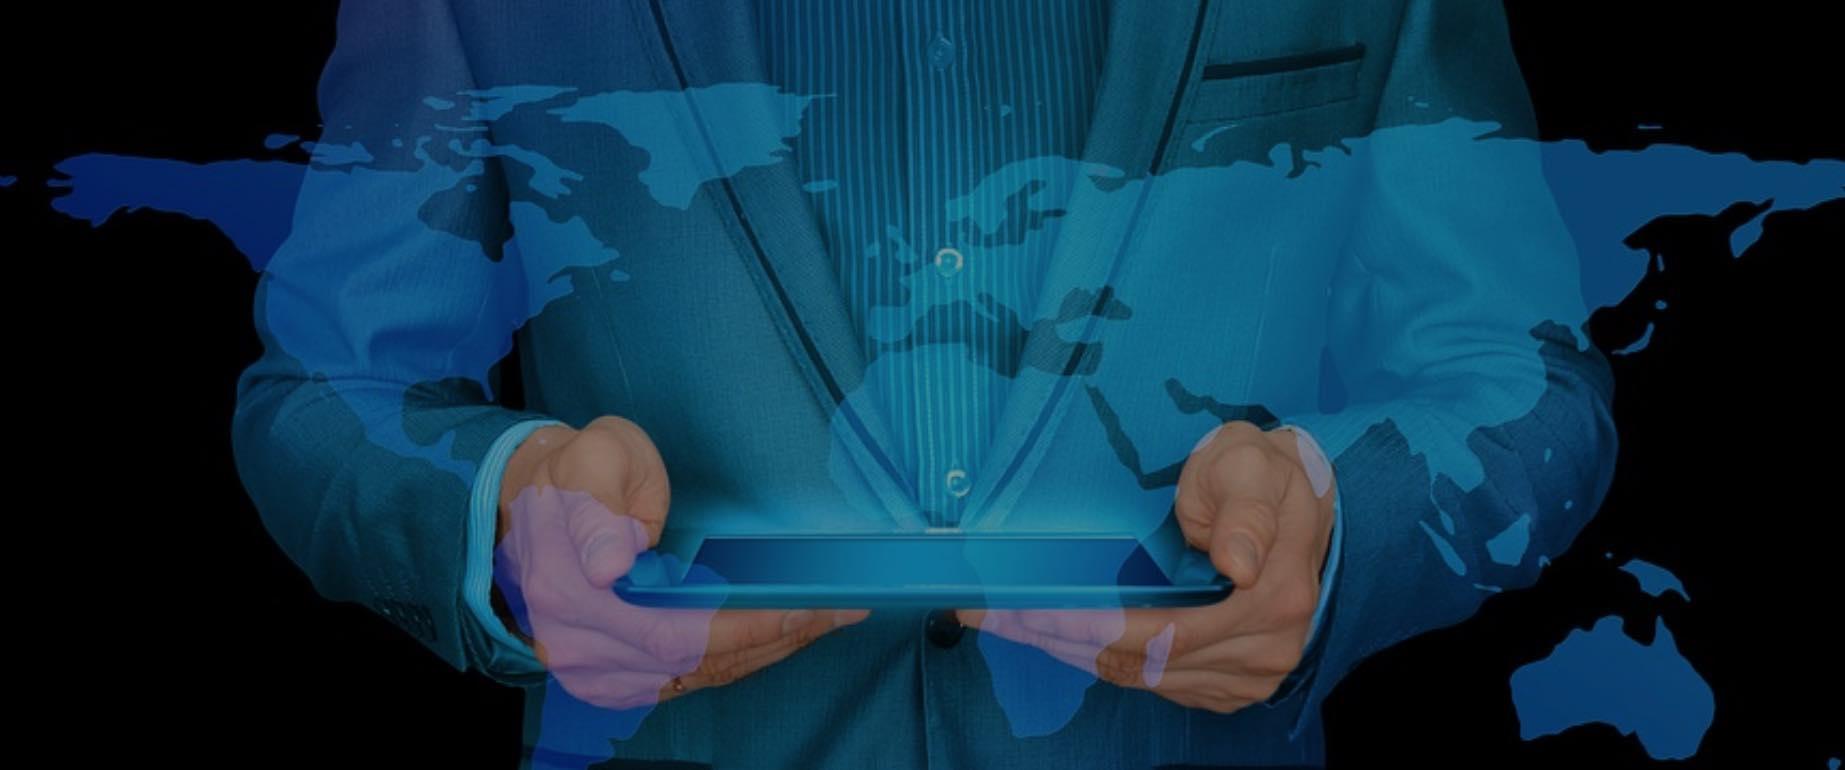 BlueMed Network